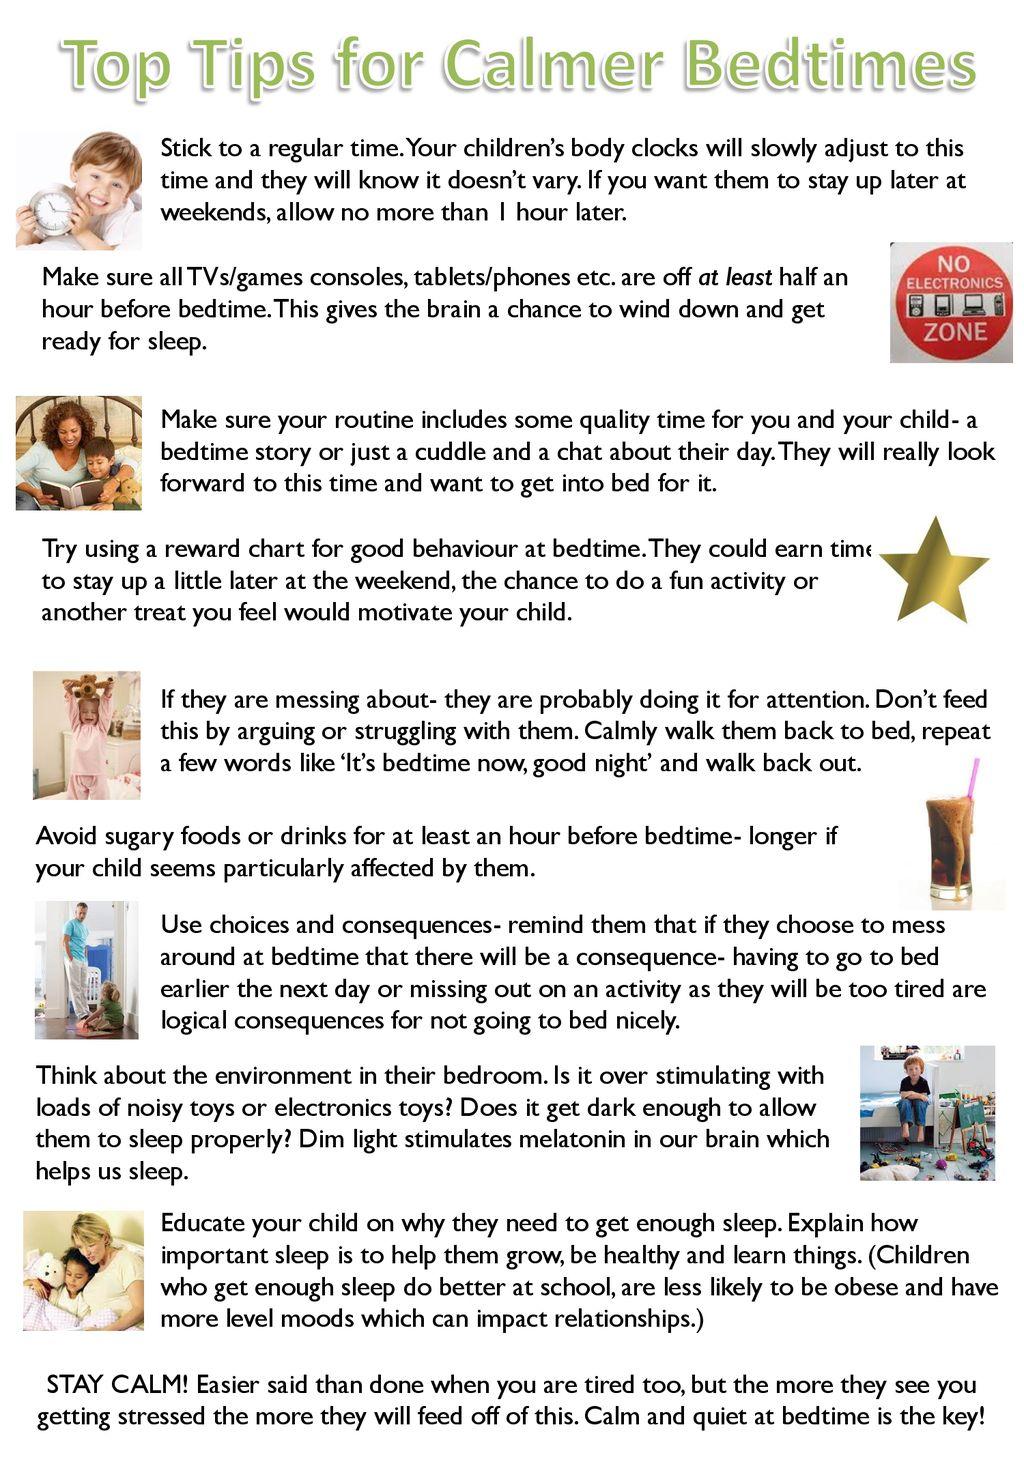 Top Tips for Calmer Bedtimes  - ppt download